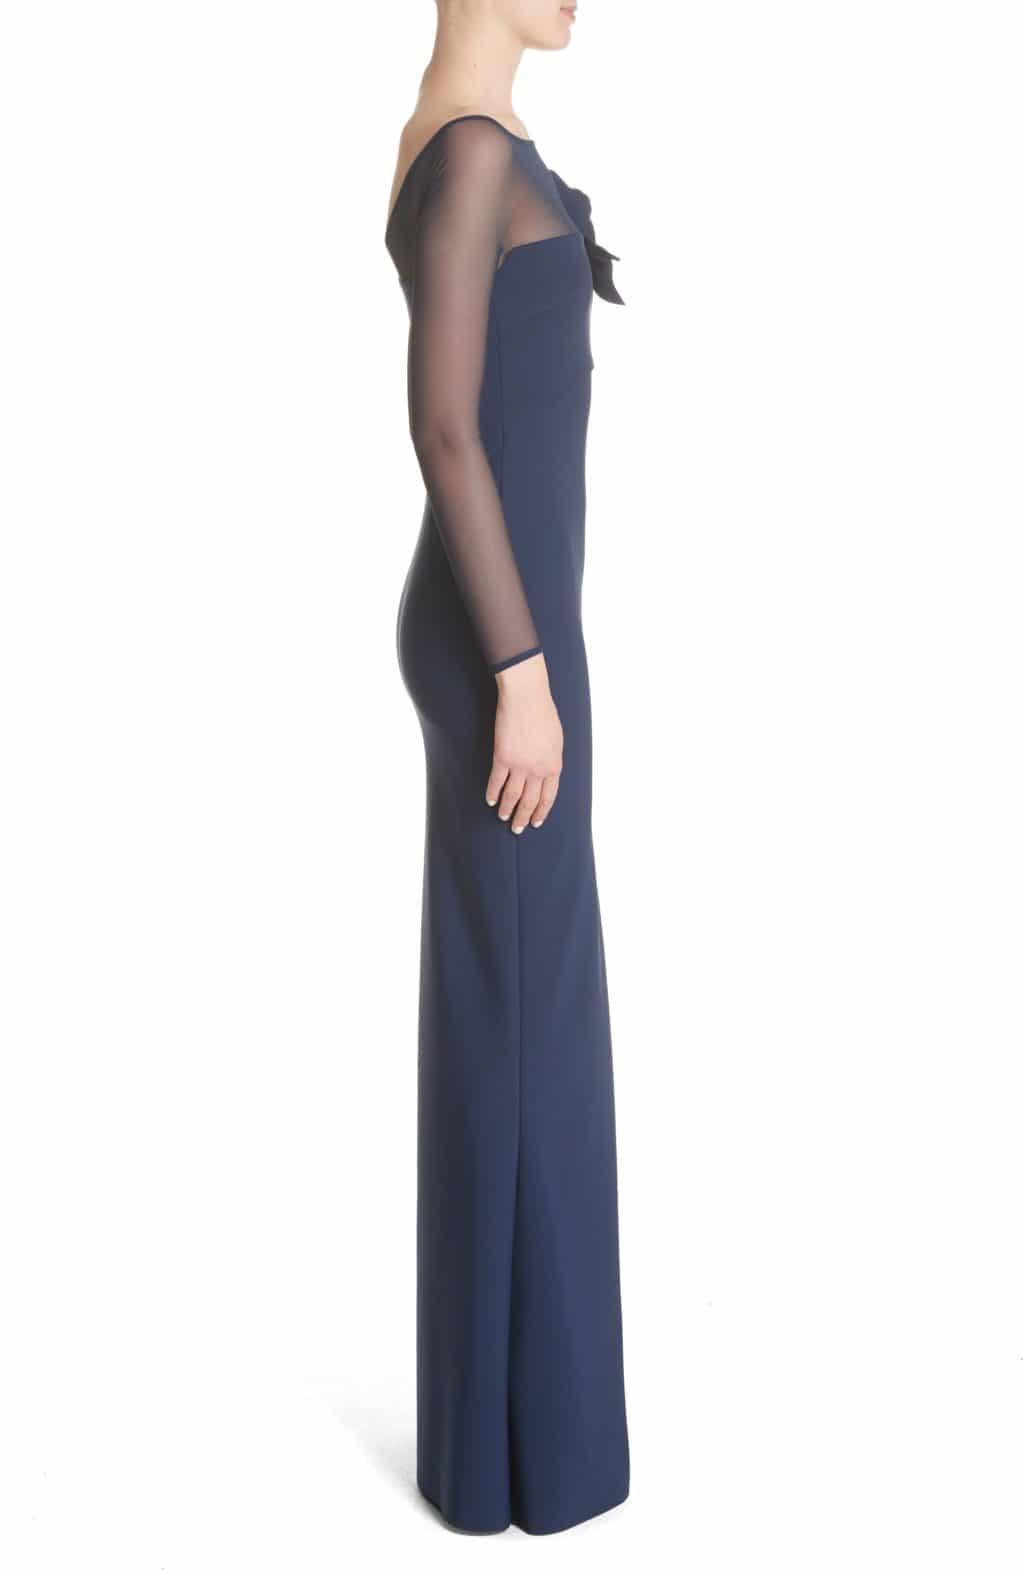 Chiara Boni La Petite Robe Saori Mesh Panel Mermaid Blue Notte Gown